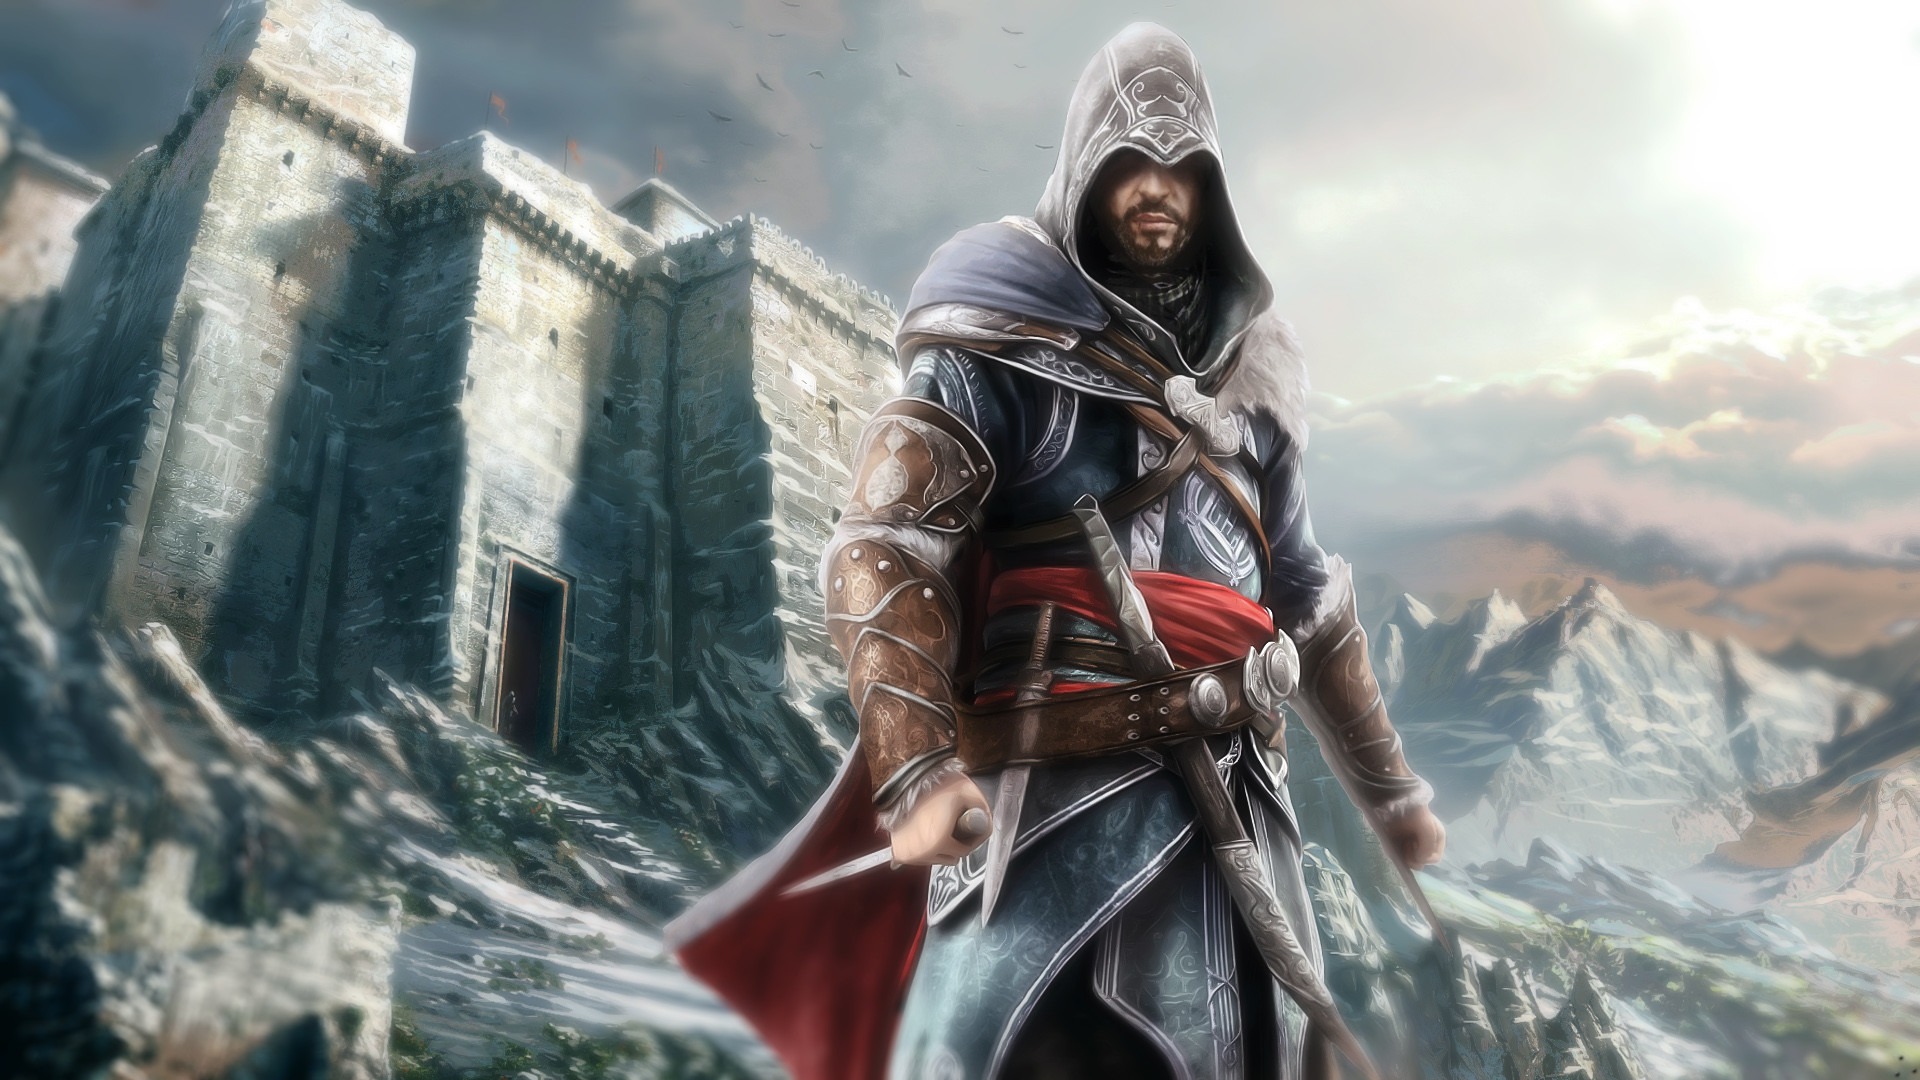 Assassin's Creed: Revelations Full HD Wallpaper